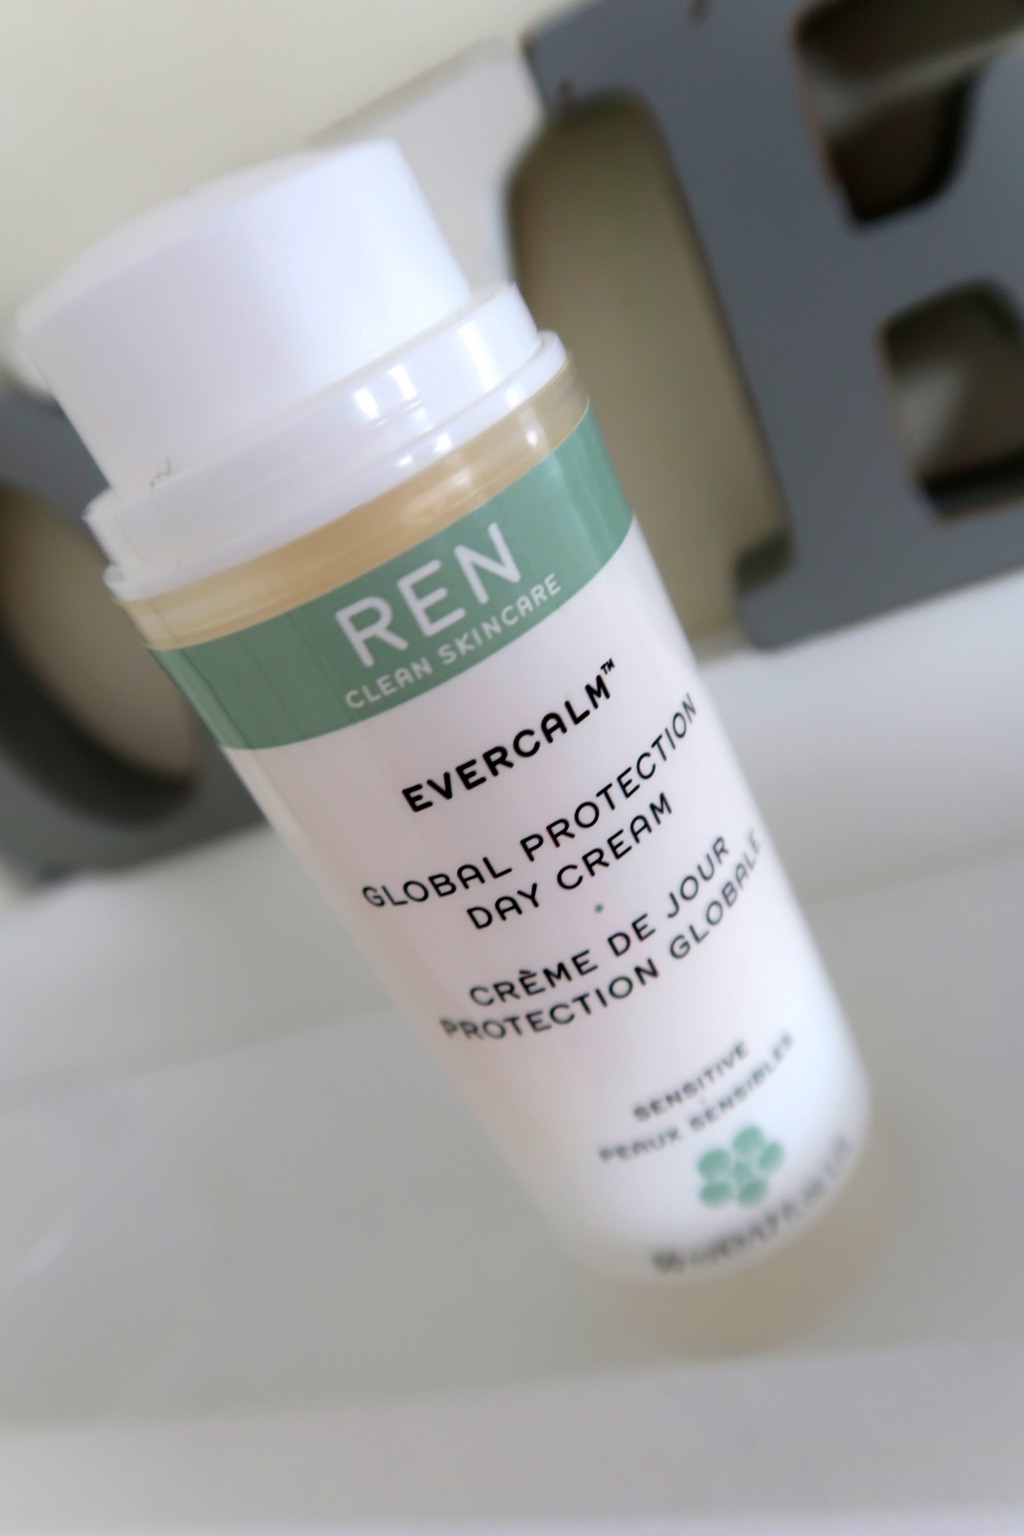 beauty-ren-evercalm-global-protection-day-cream